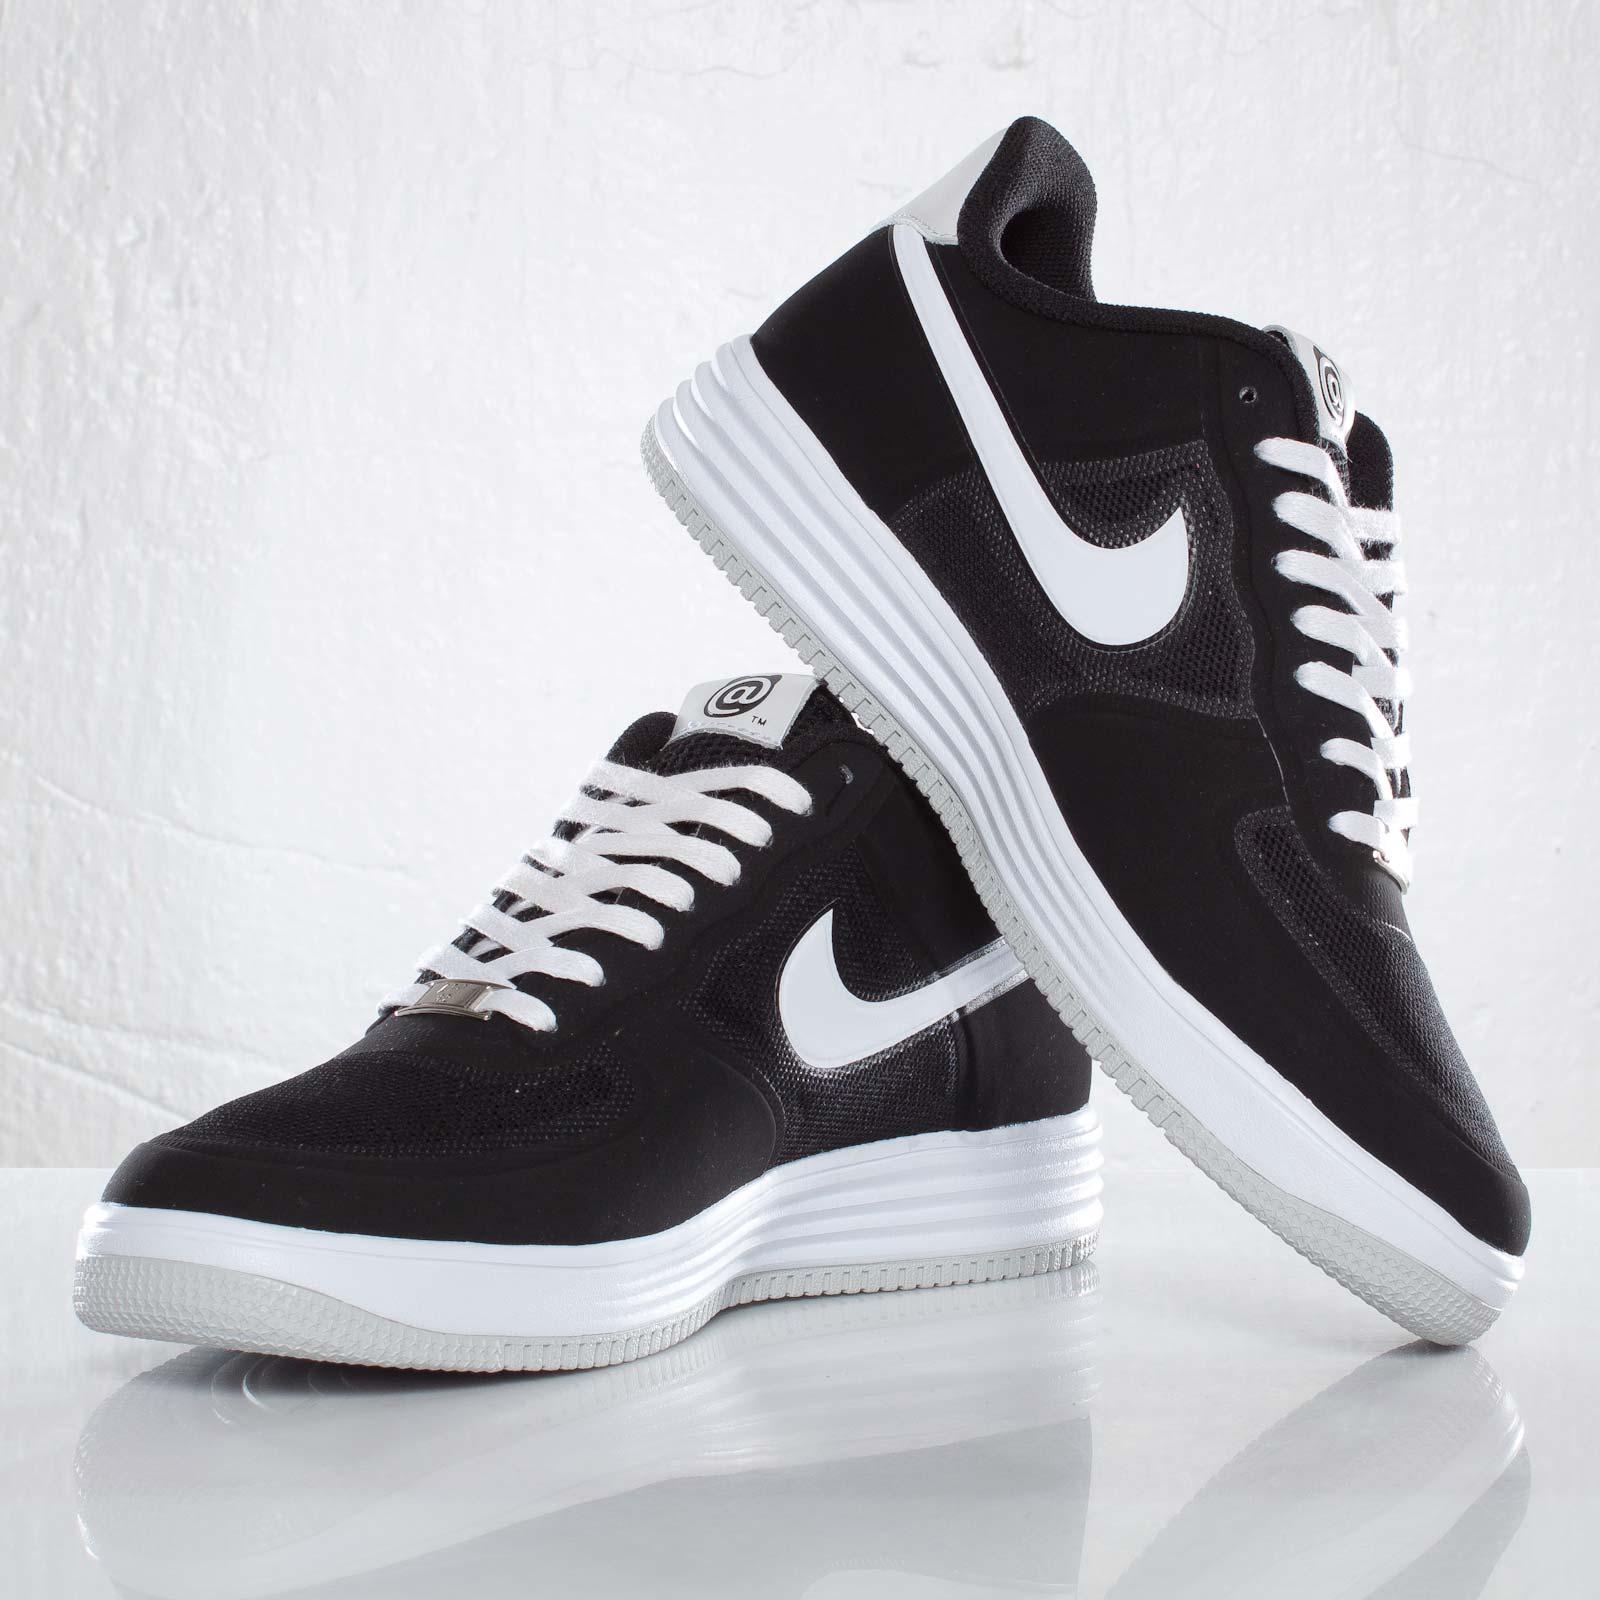 8b8edd6ea143 Nike Lunar Force 1 Fuse NRG - 573980-003 - Sneakersnstuff